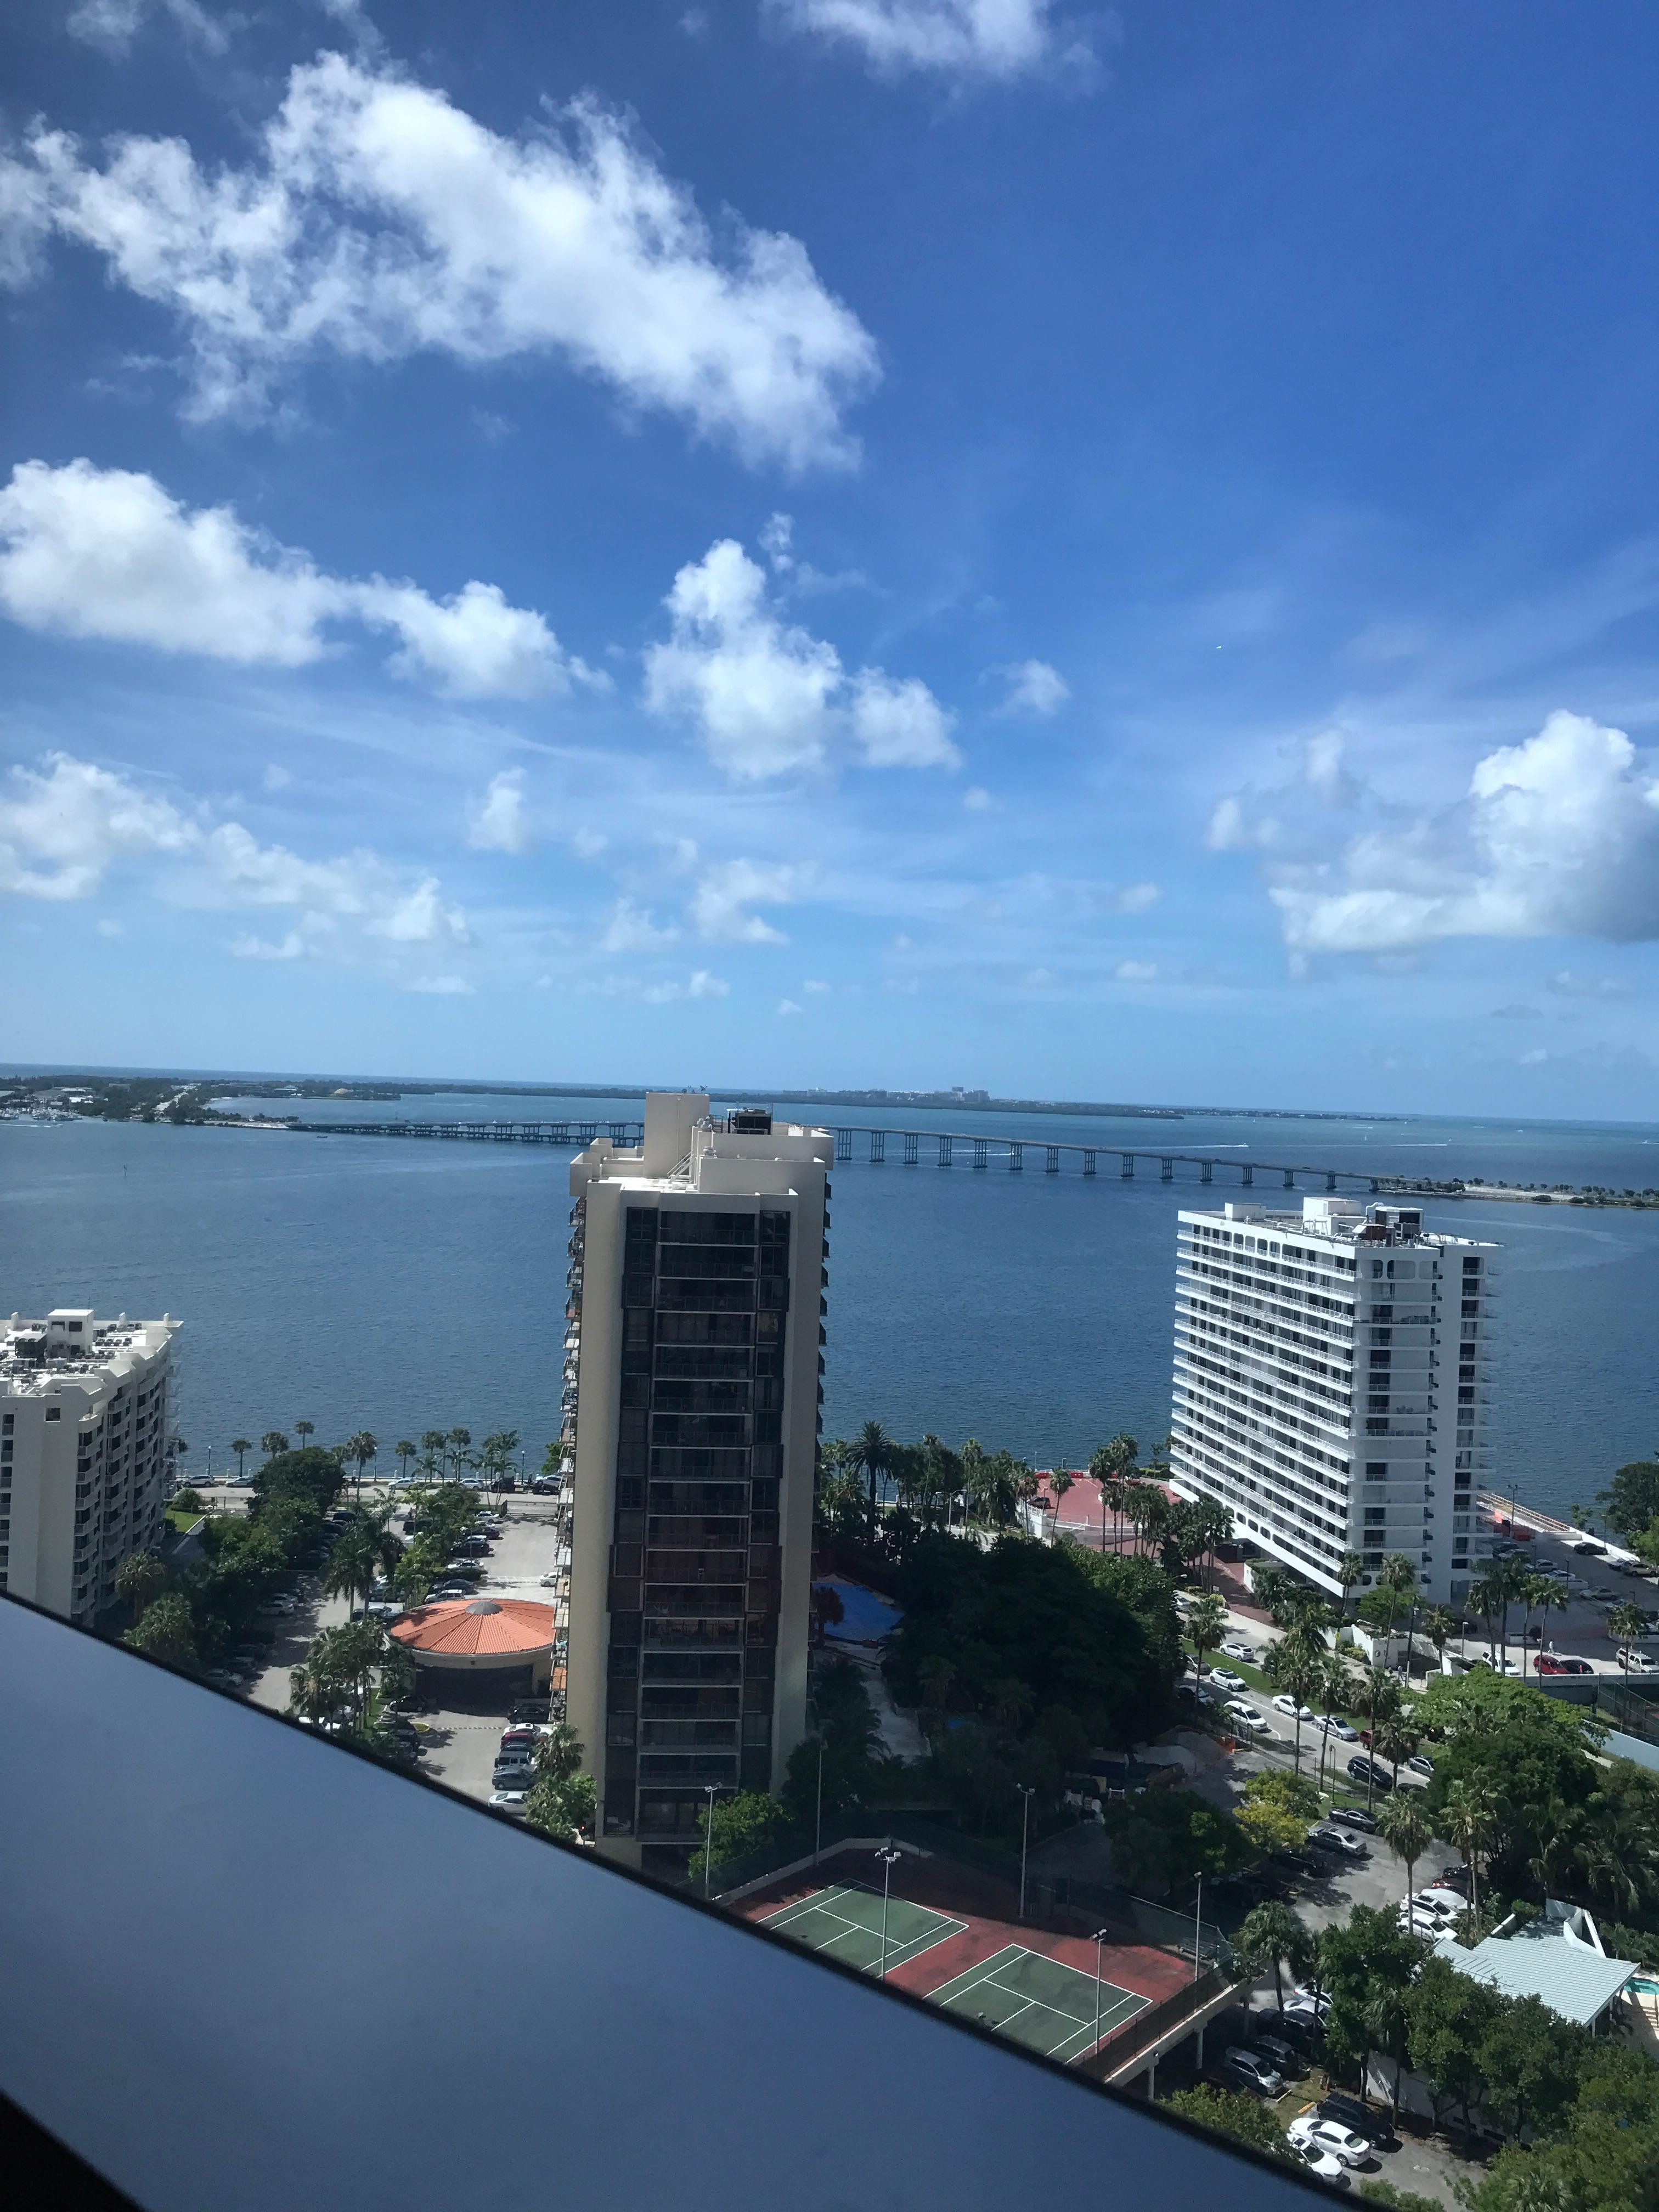 Wonderful view!!